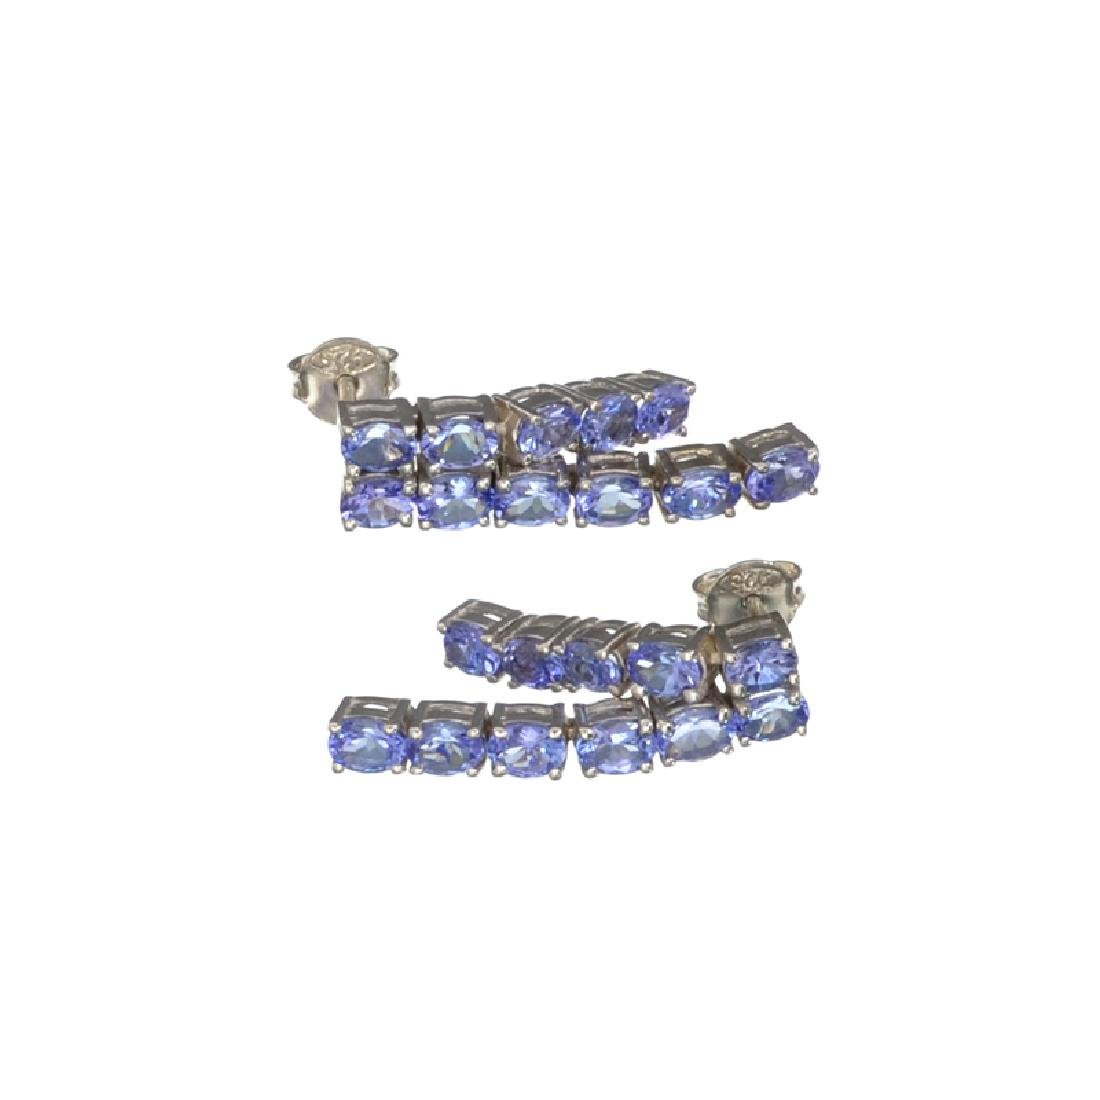 APP: 2.8k Fine Jewelry 3.66CT Oval Cut Tanzanite And